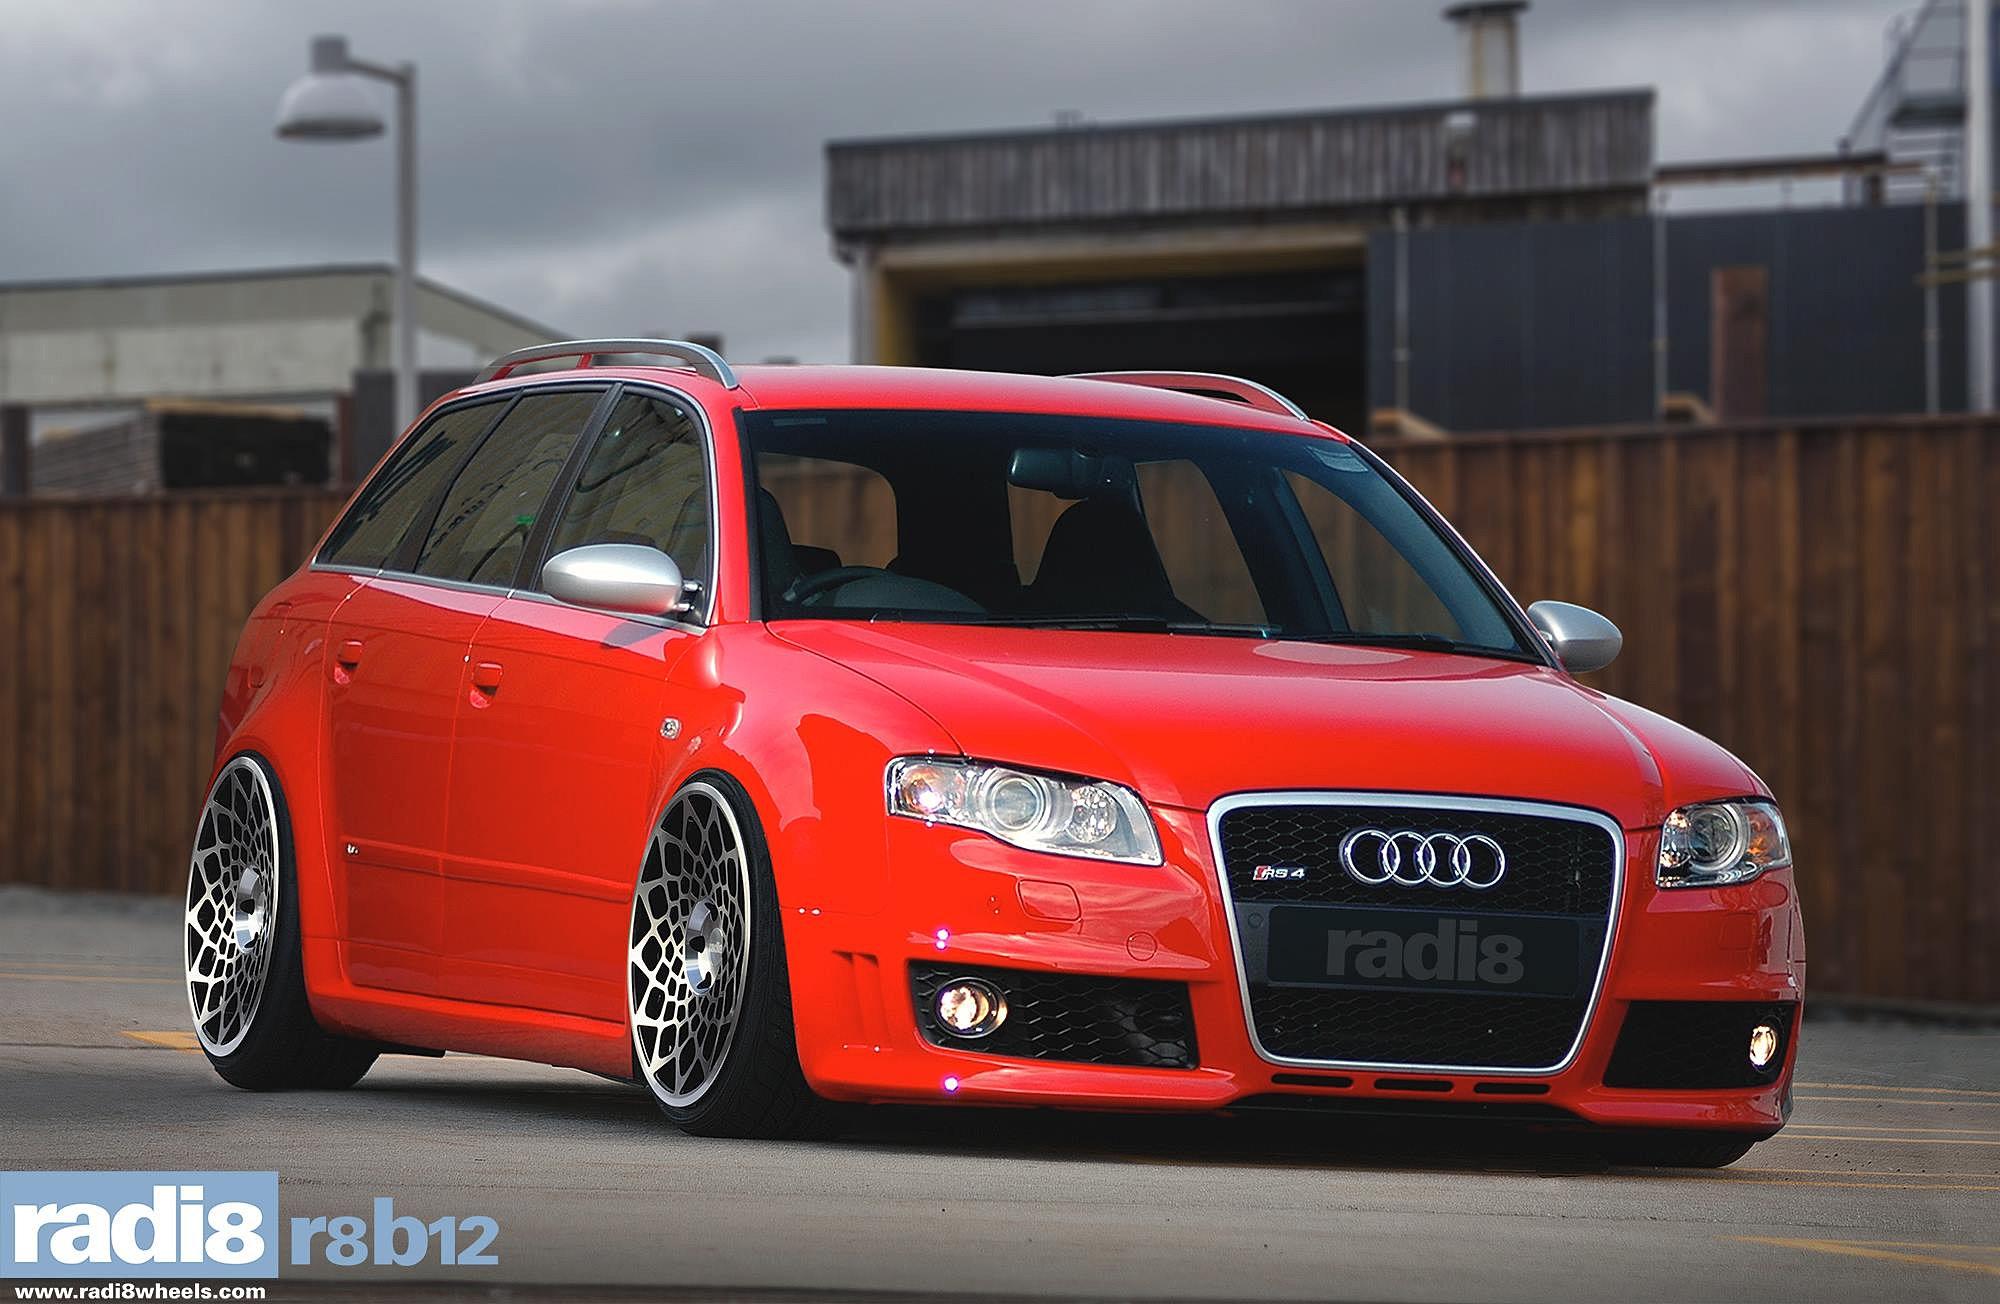 Radi8 Usa Wheels R8s5 Radi8 R8b12 Wheels Audi Rs 4